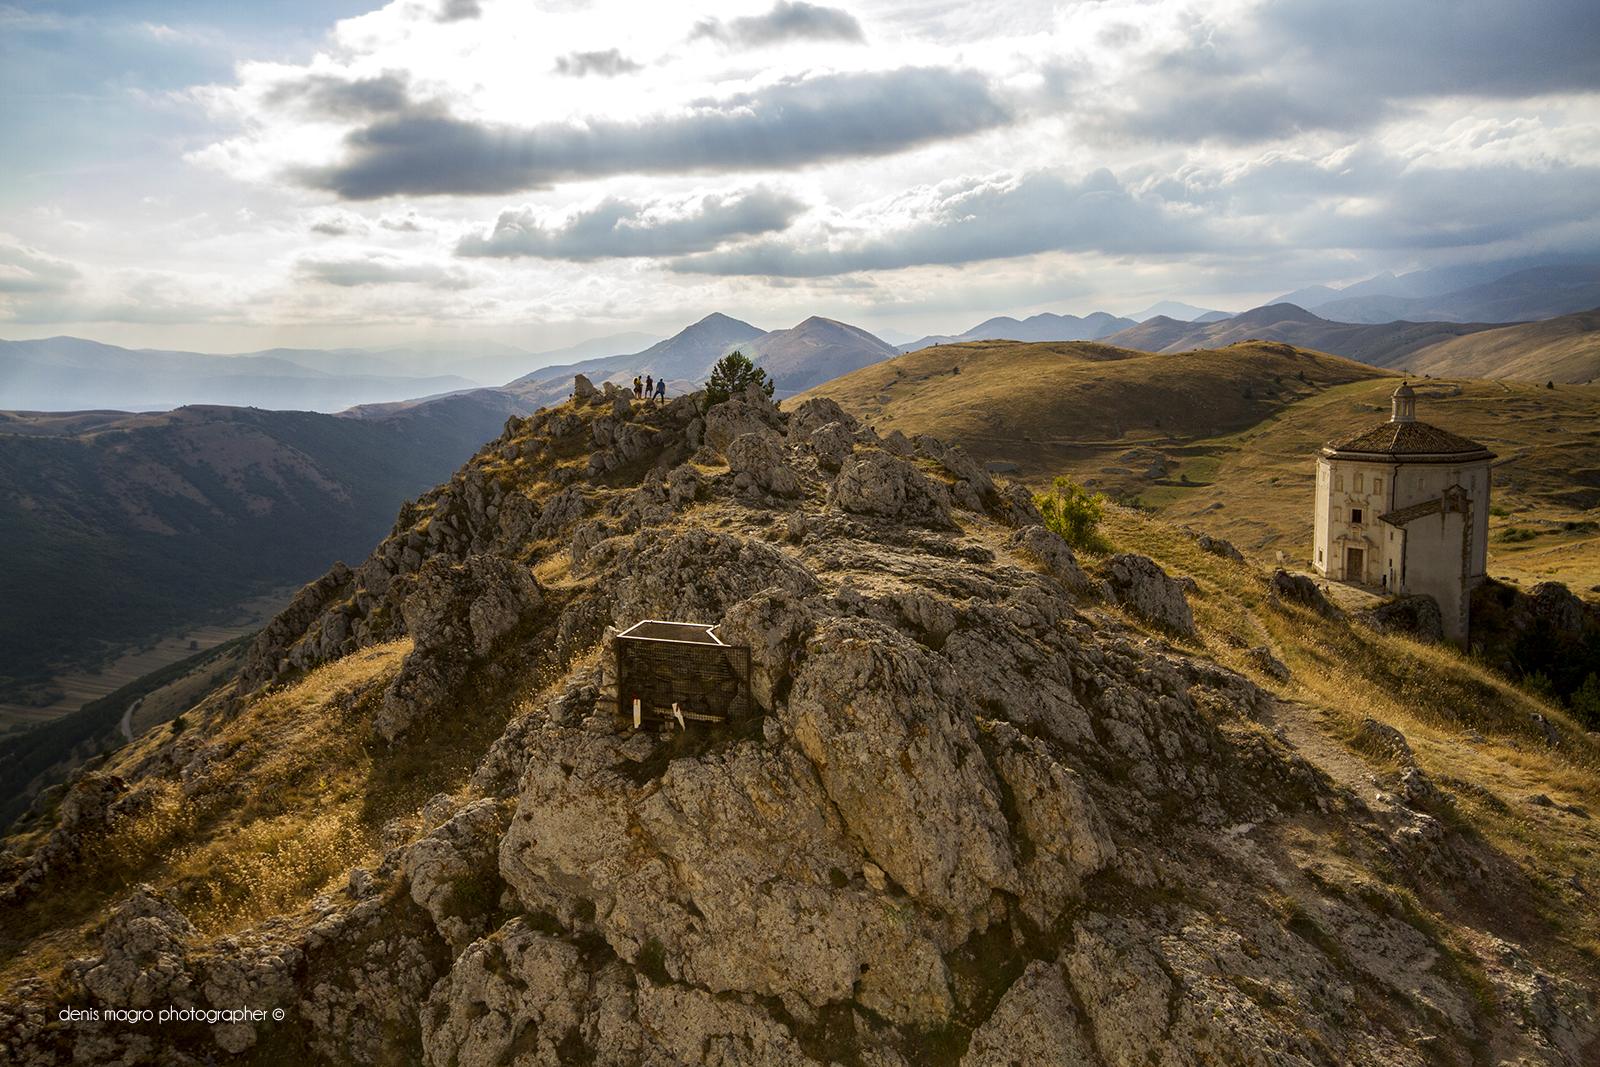 Rocca Calascio / Abruzzo / Denis Magro photographer